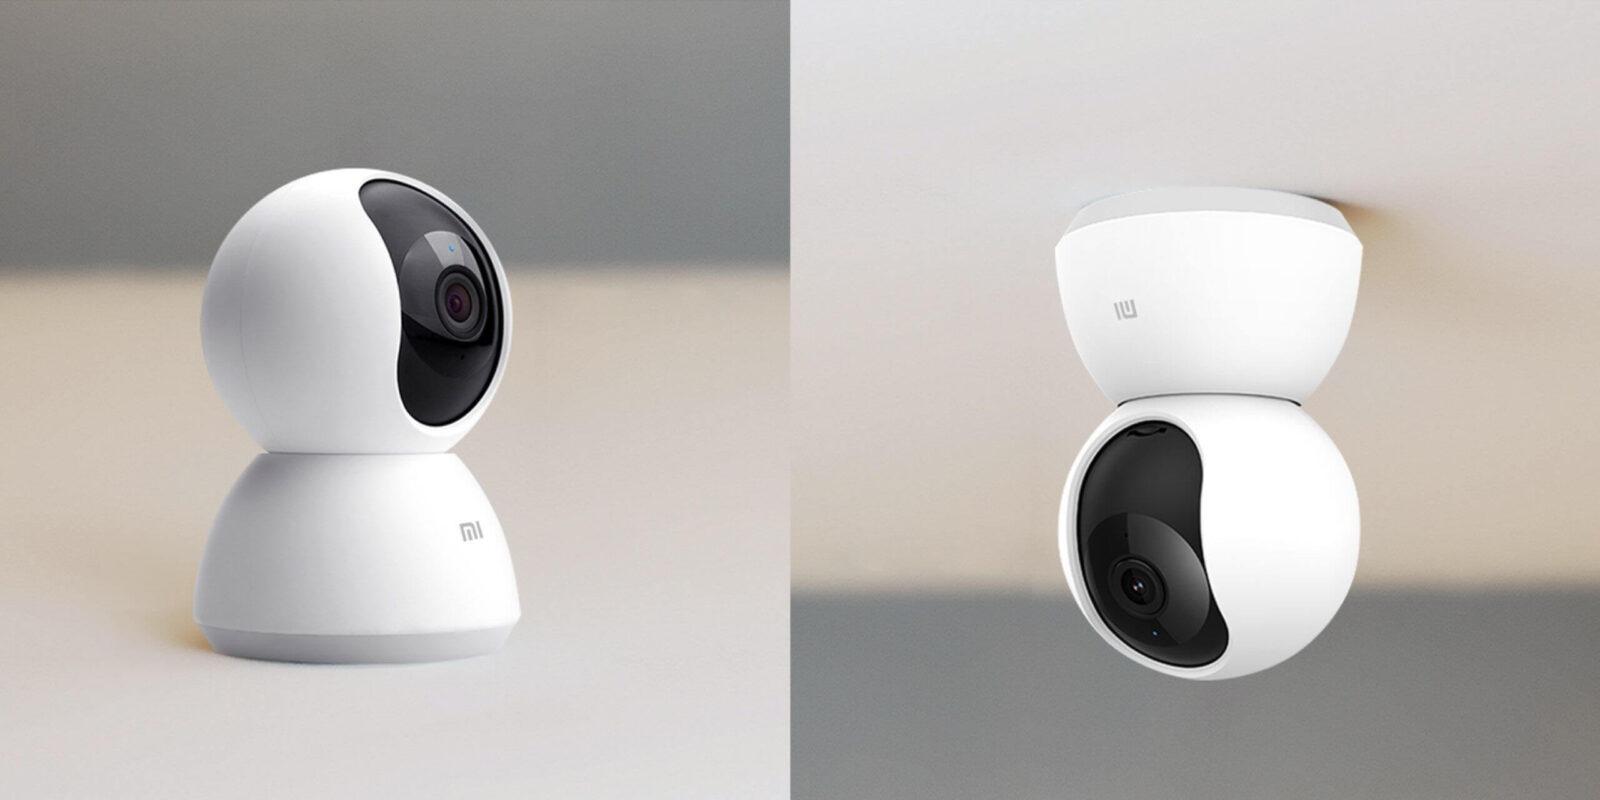 Solo 30 € la Xiaomi Mi Home, evoluta videocamera Wi-Fi di sicurezza, per una casa più sicura